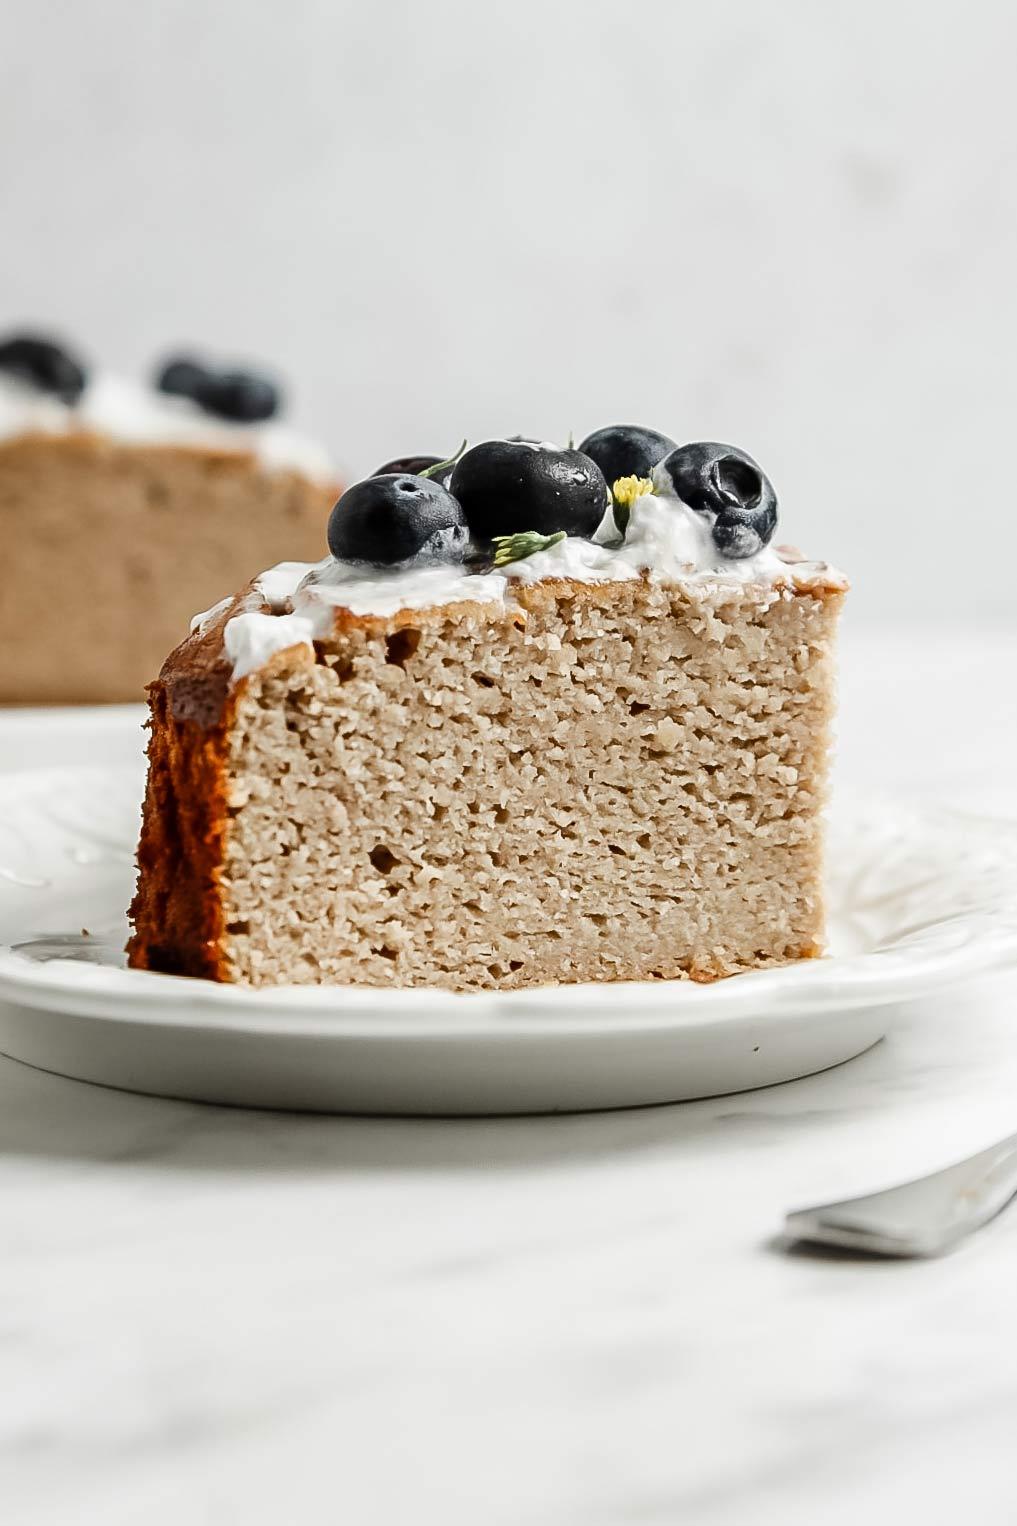 Slice of grain free banana cake on small plate